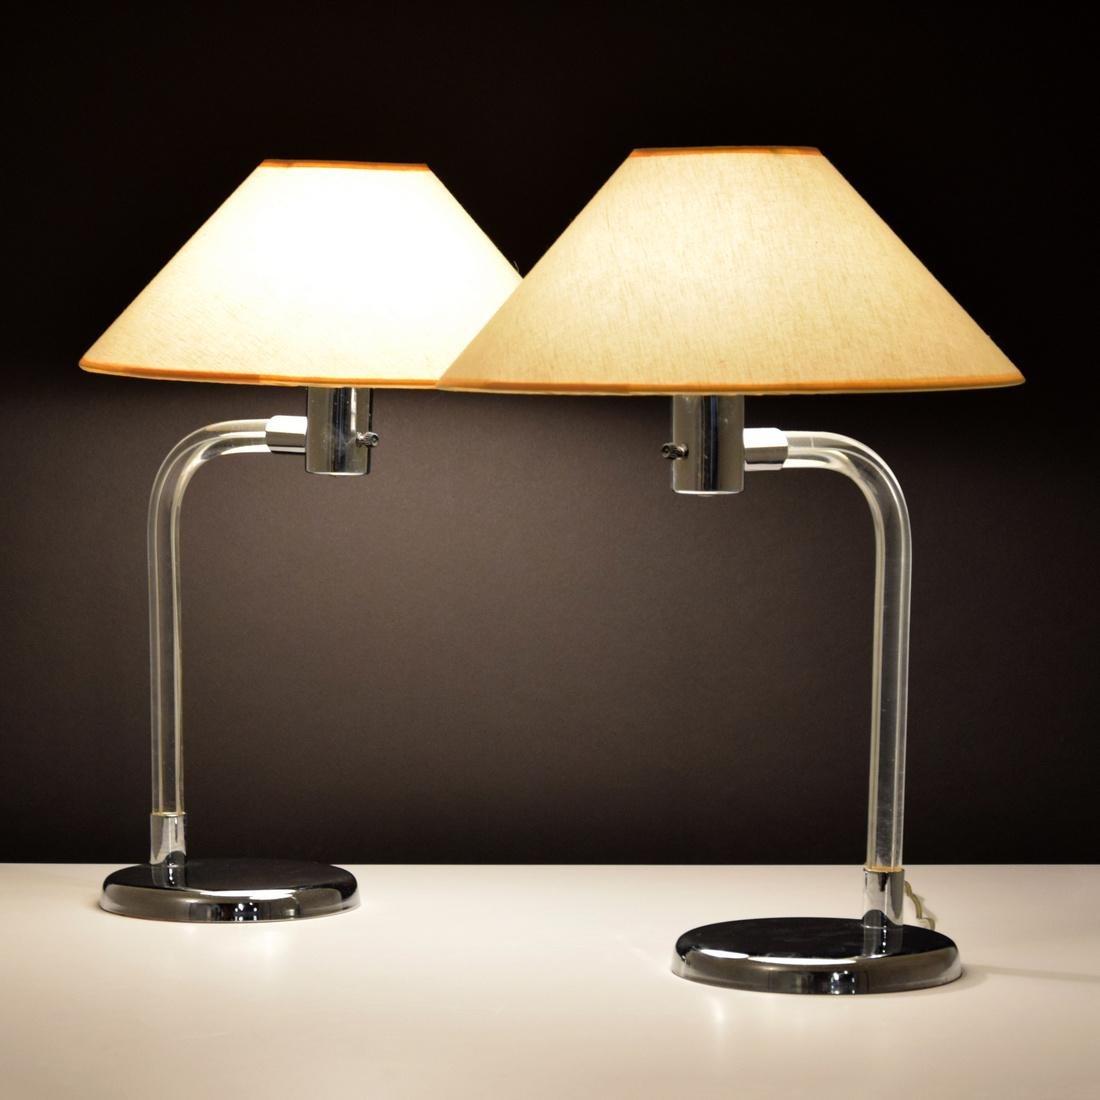 Pair of Peter Hamburger Lamps